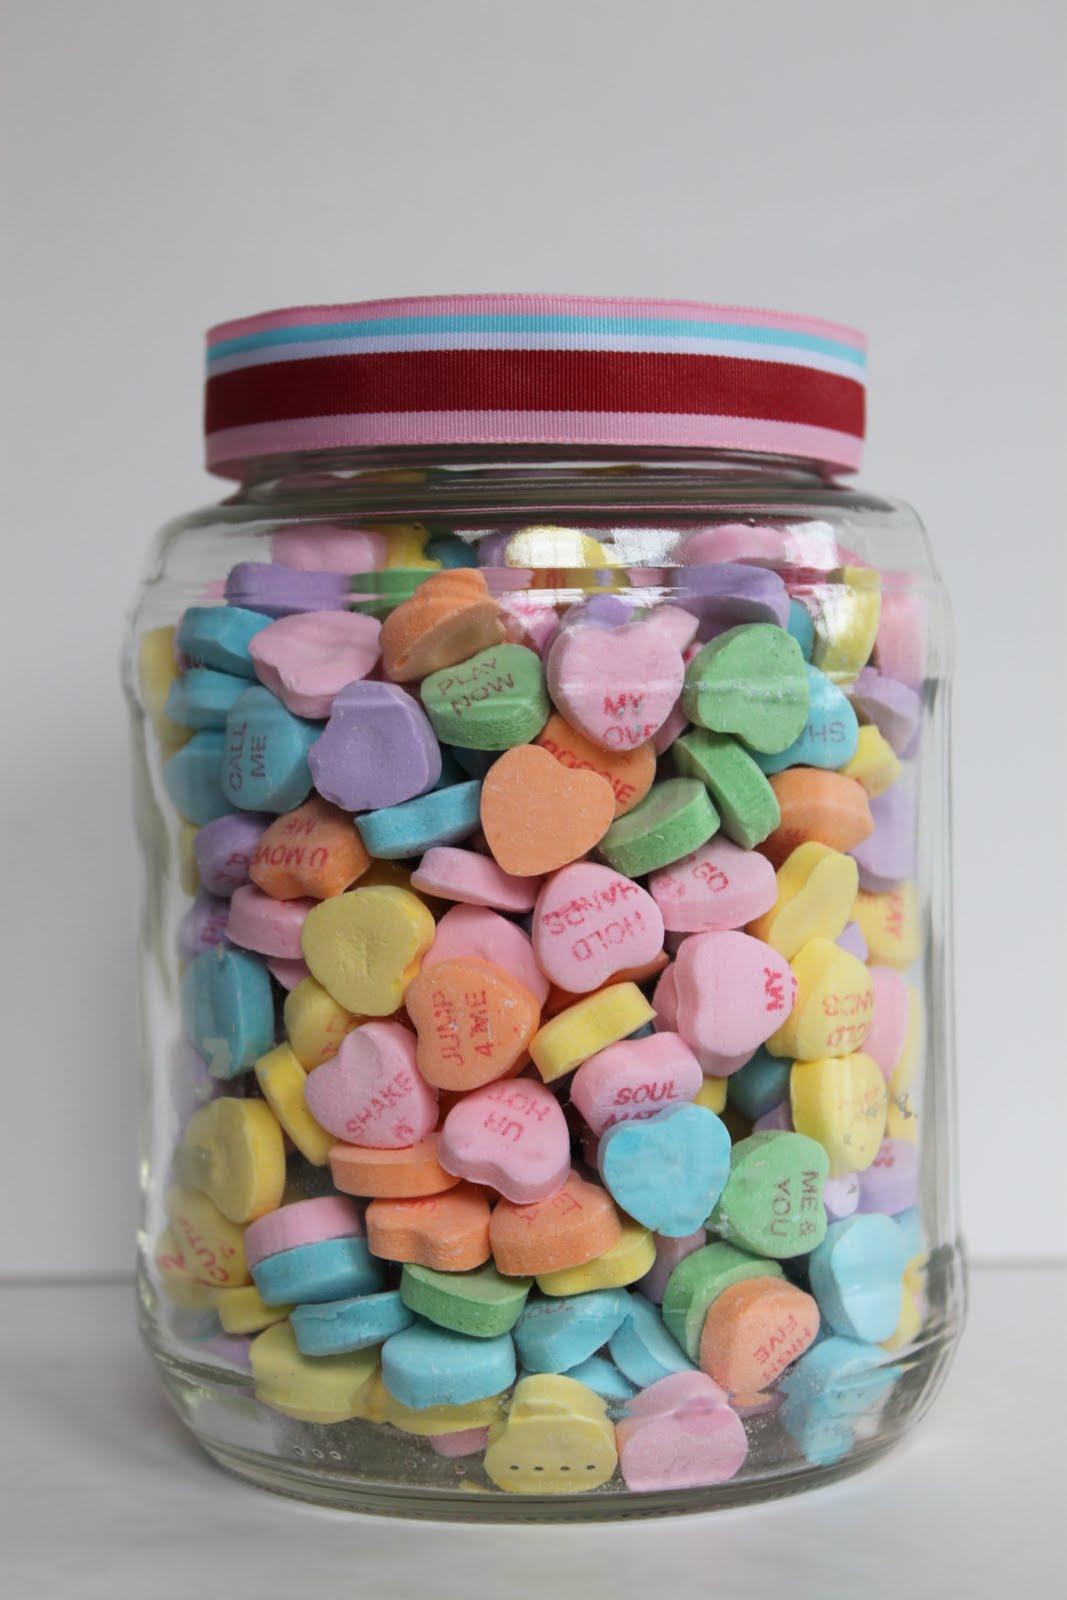 Crave Indulge Satisfy Valentine S Giveaway